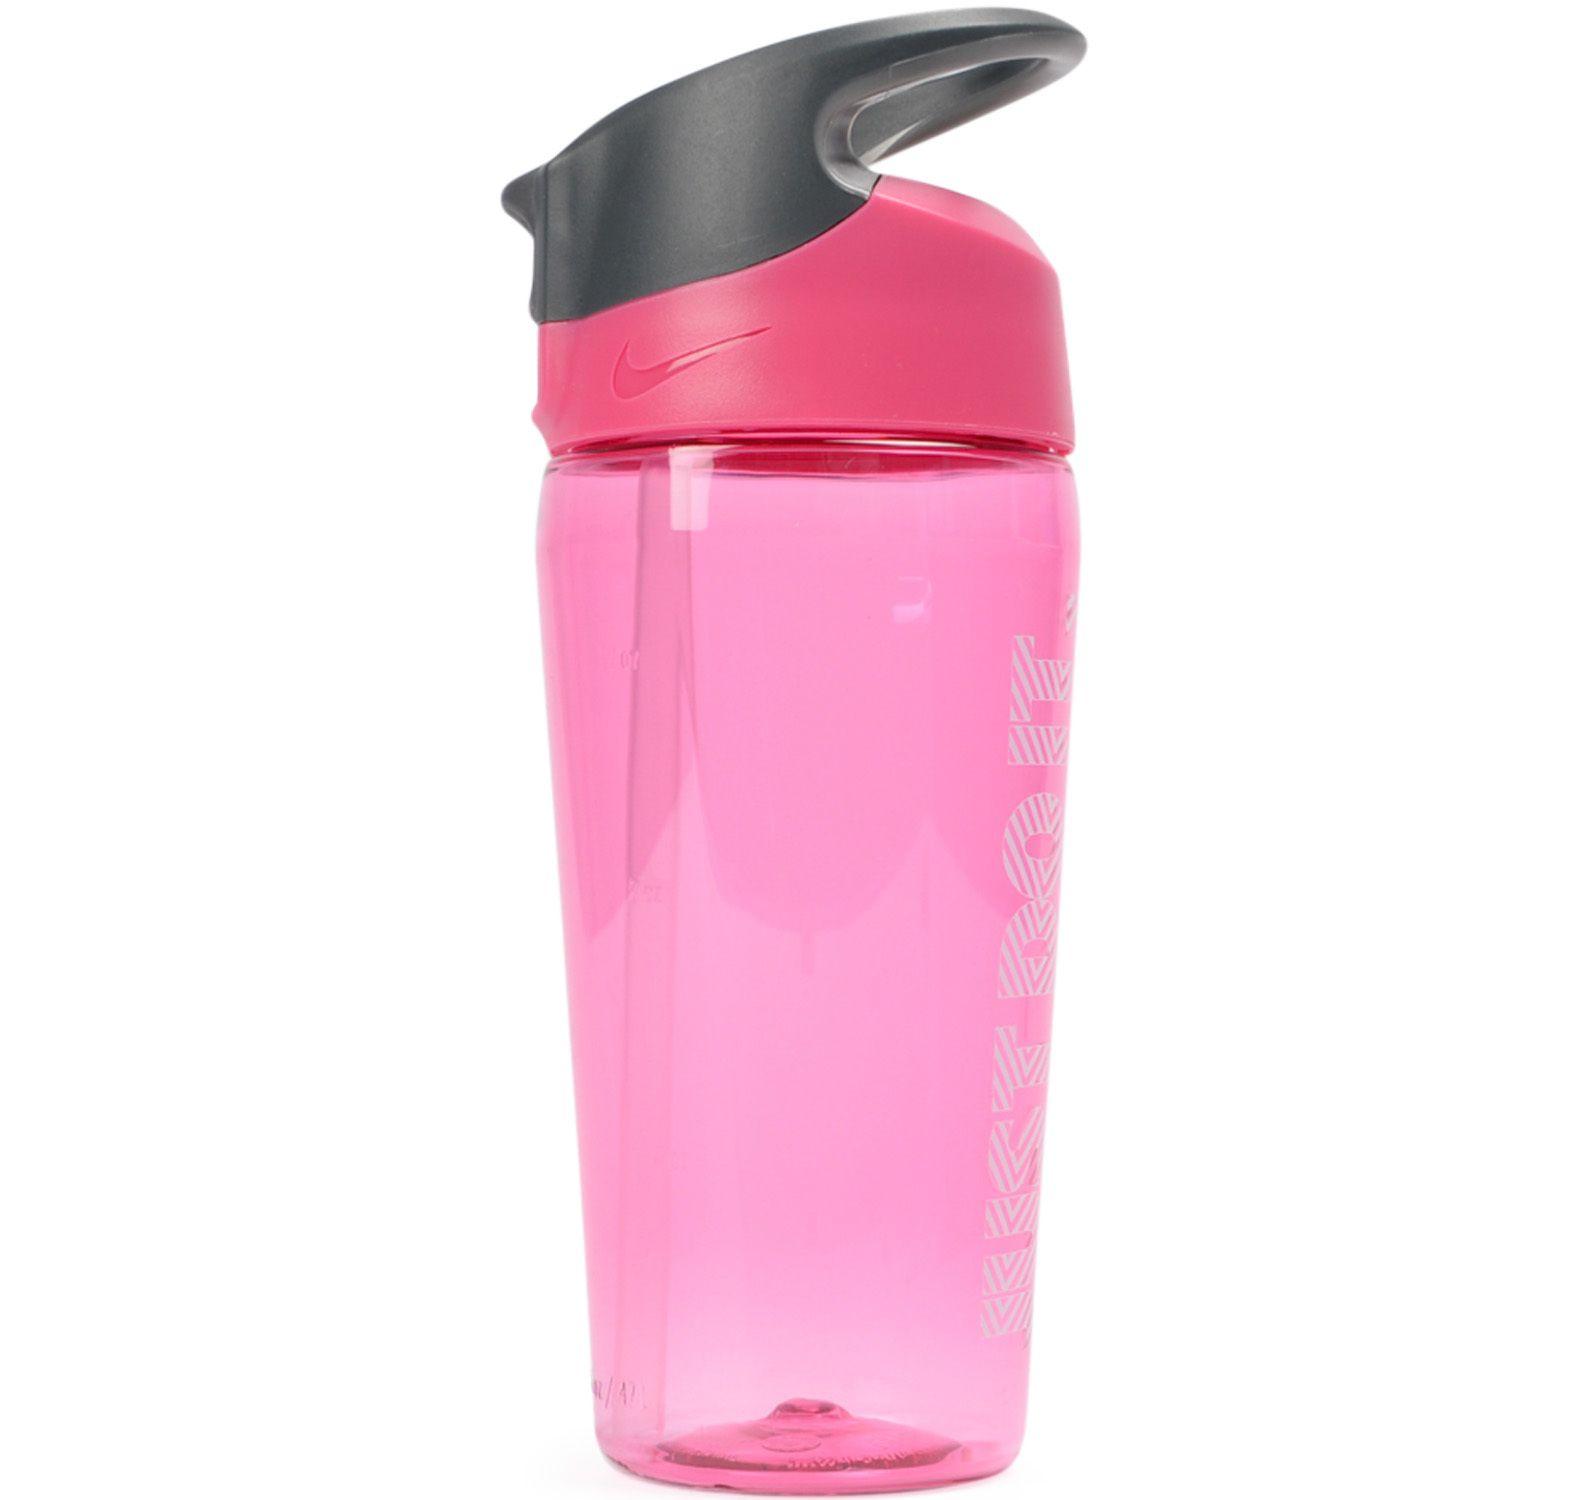 Nike Tr Hypercharge Straw Bott, Vivid Pink/Cool Grey/White, 500, Nike